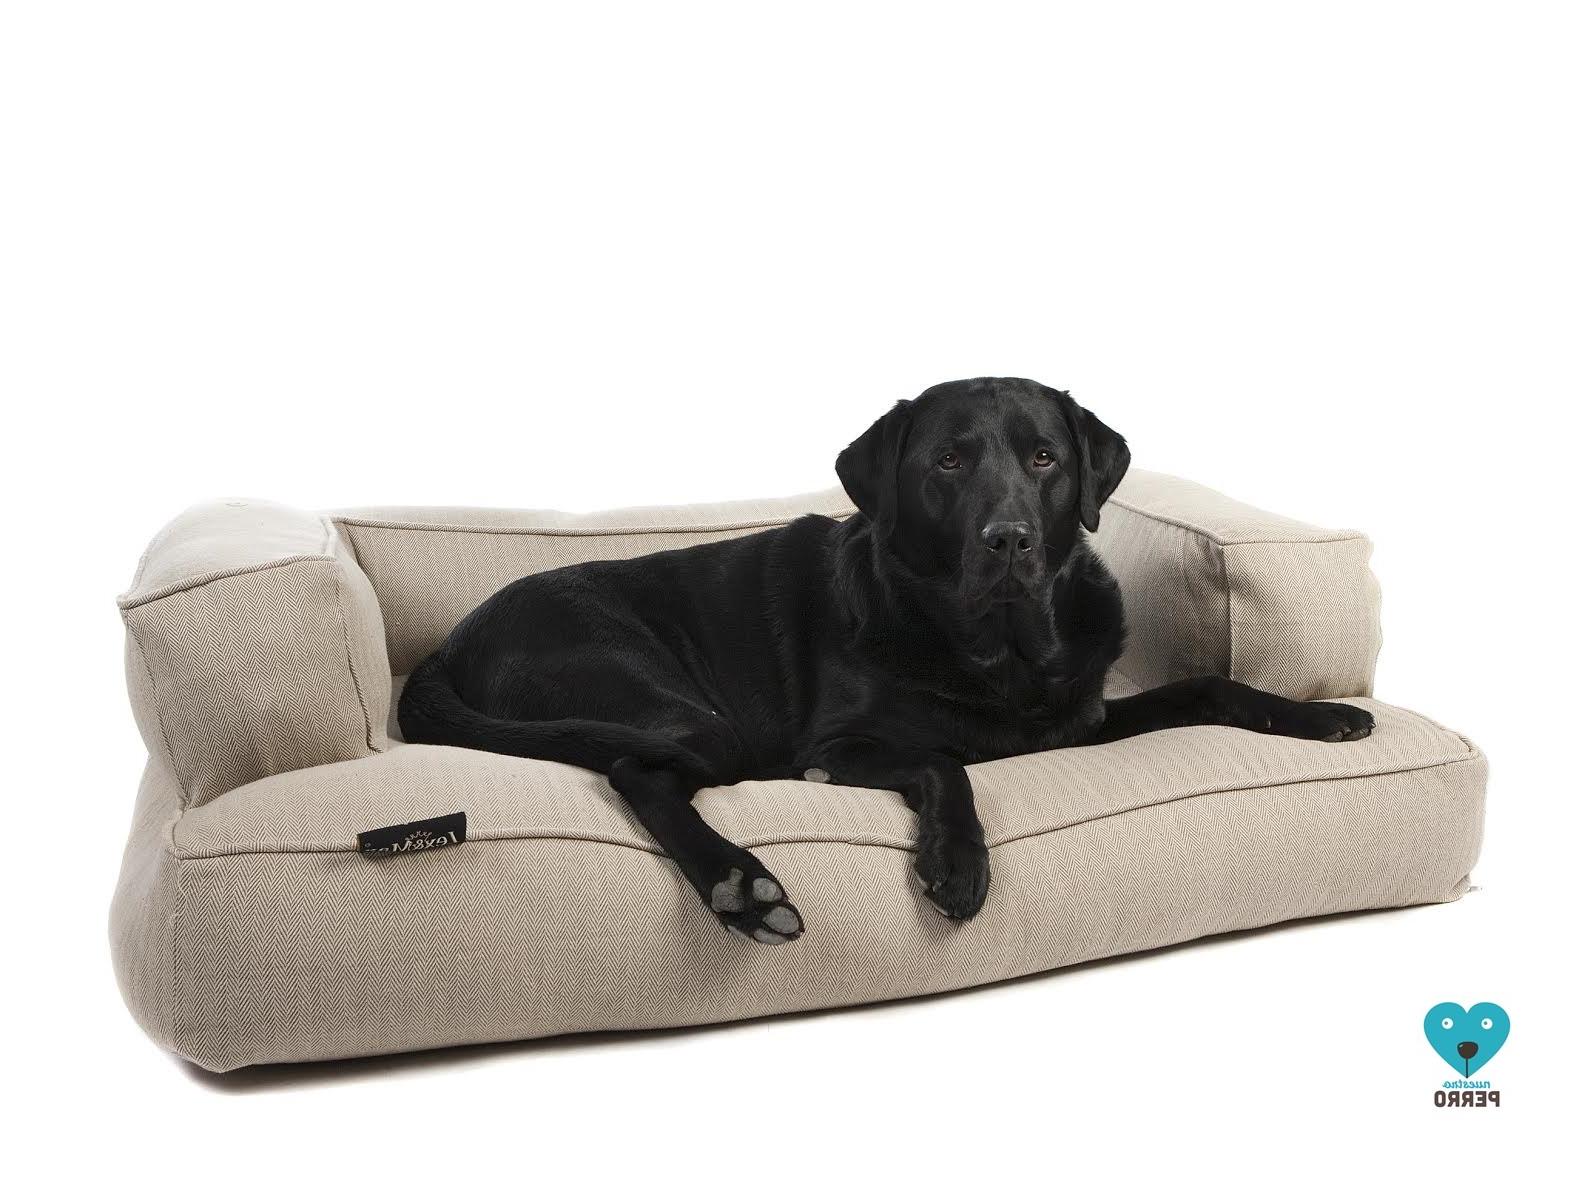 Sofas Para Perros Zwd9 Lex Max sofà S De Viscoelastica Para Perro